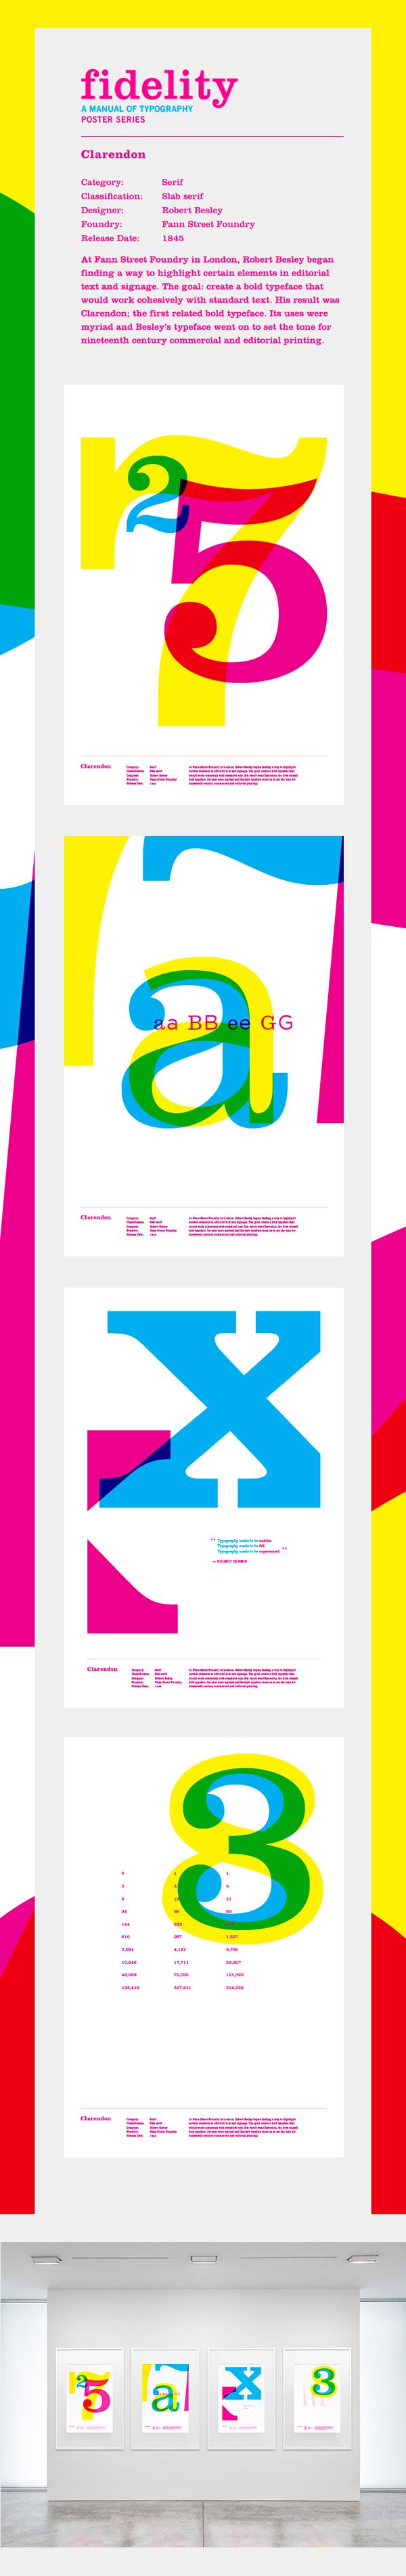 CMYK Clarendon university of kansas dustin johnson poster series Typeface multiply fidelity typographic manual robert besley bold serif slab serif